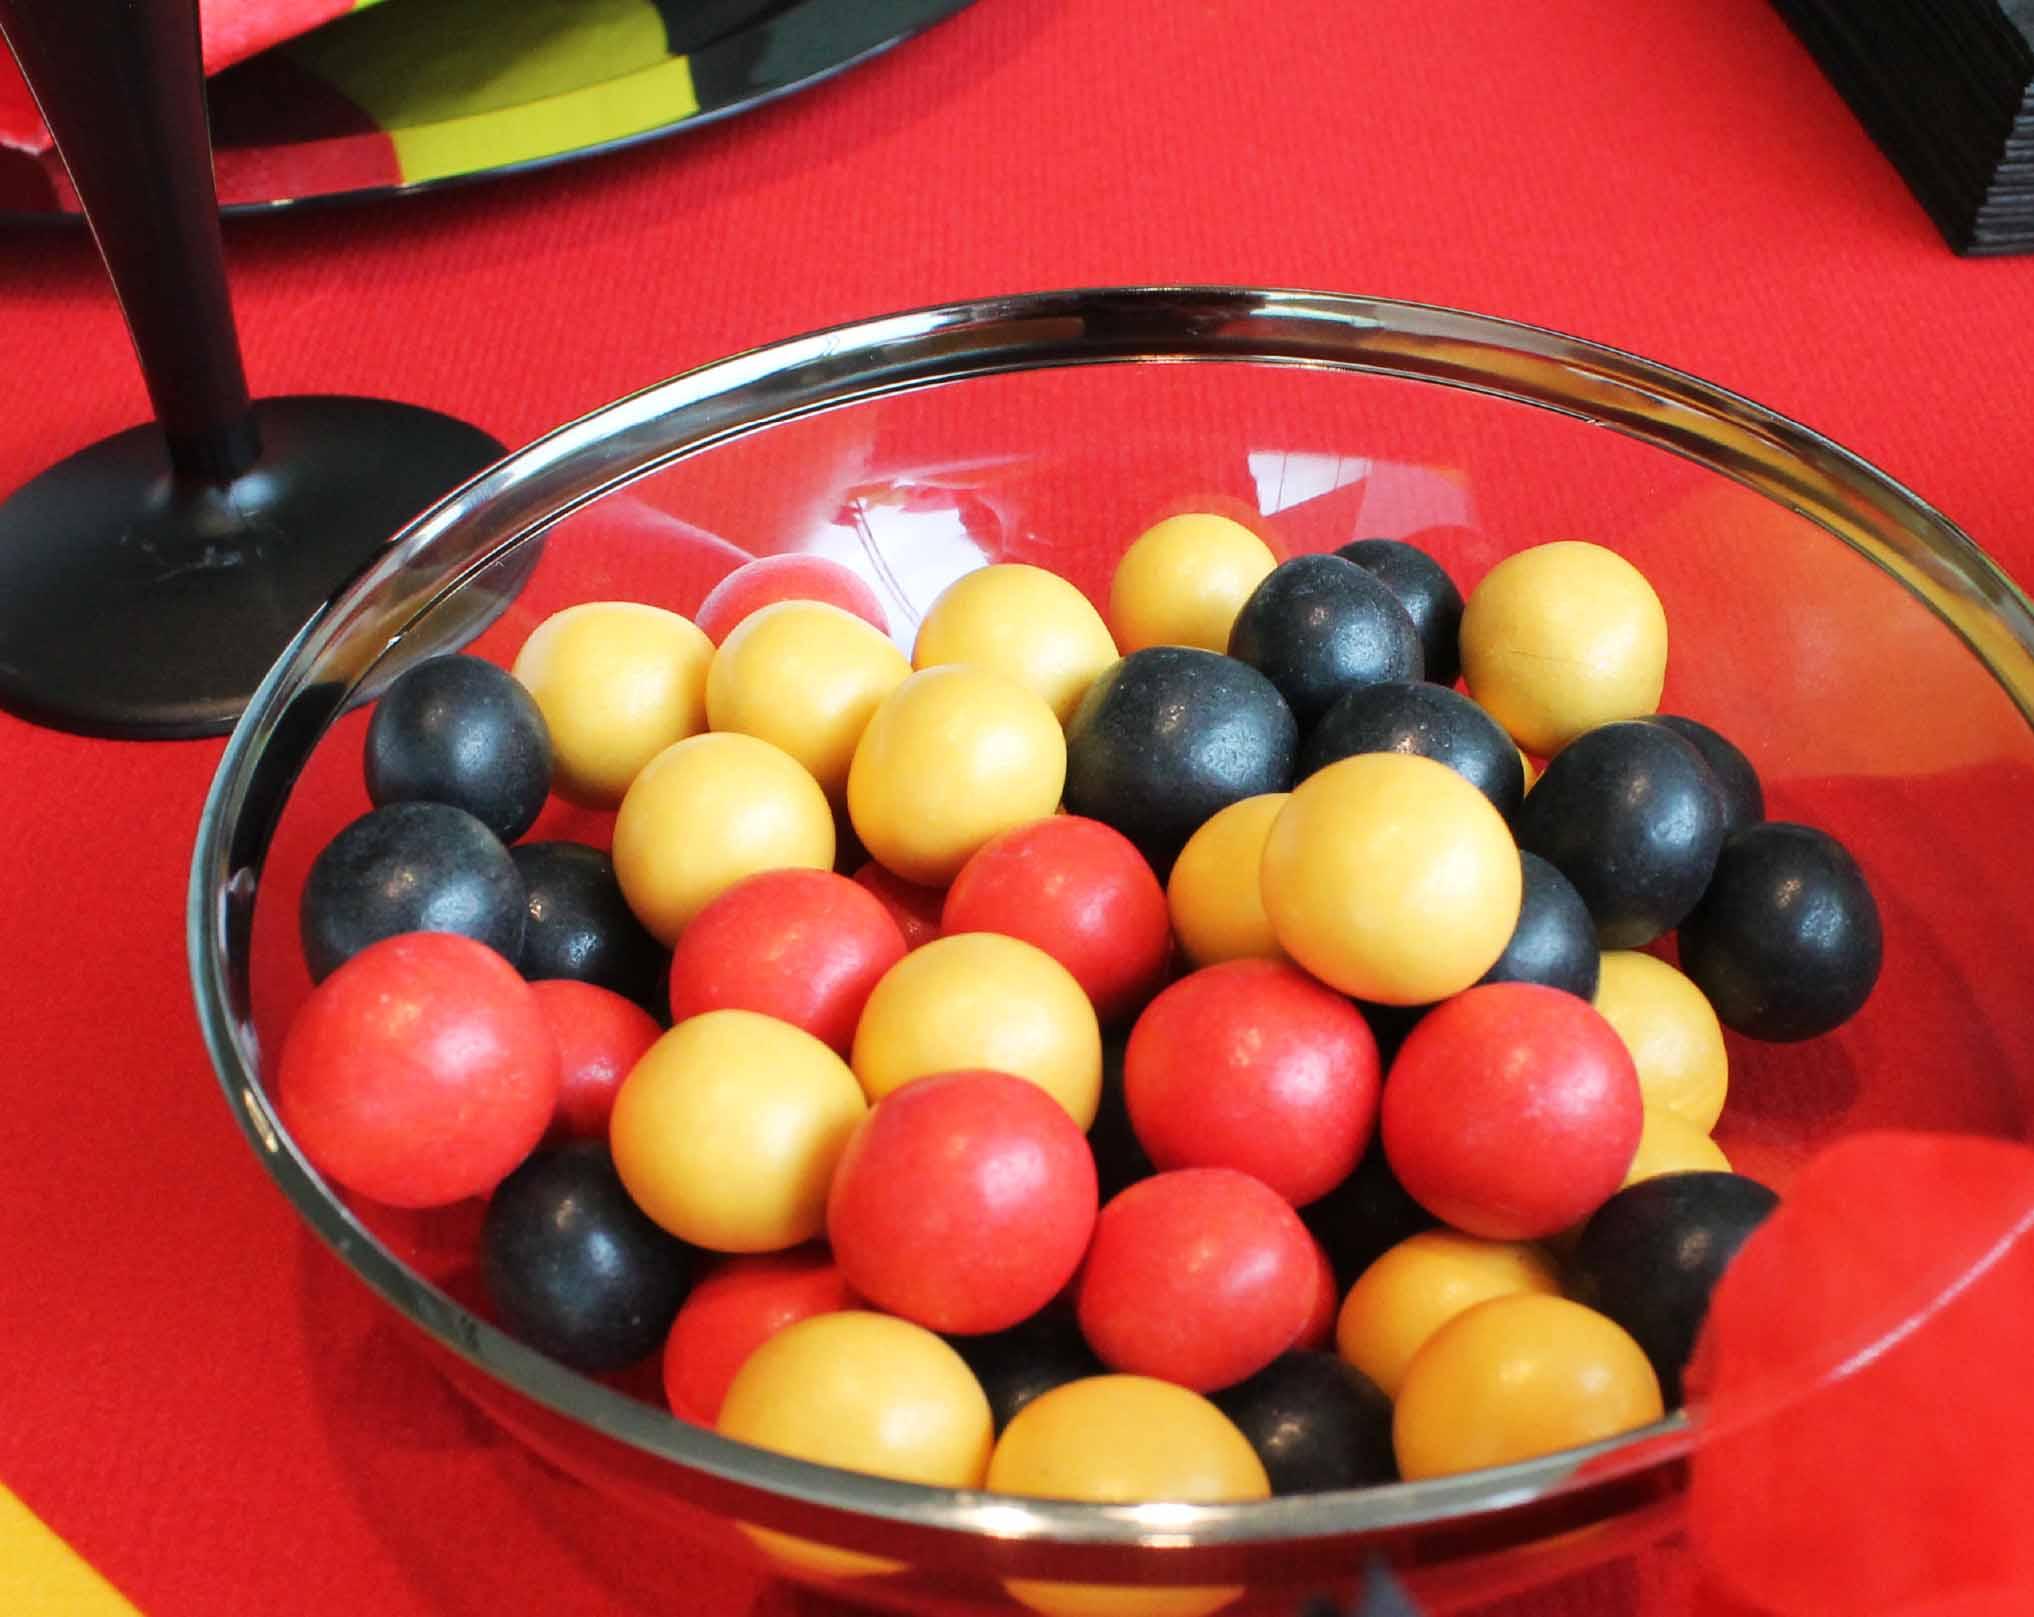 snoepjes België